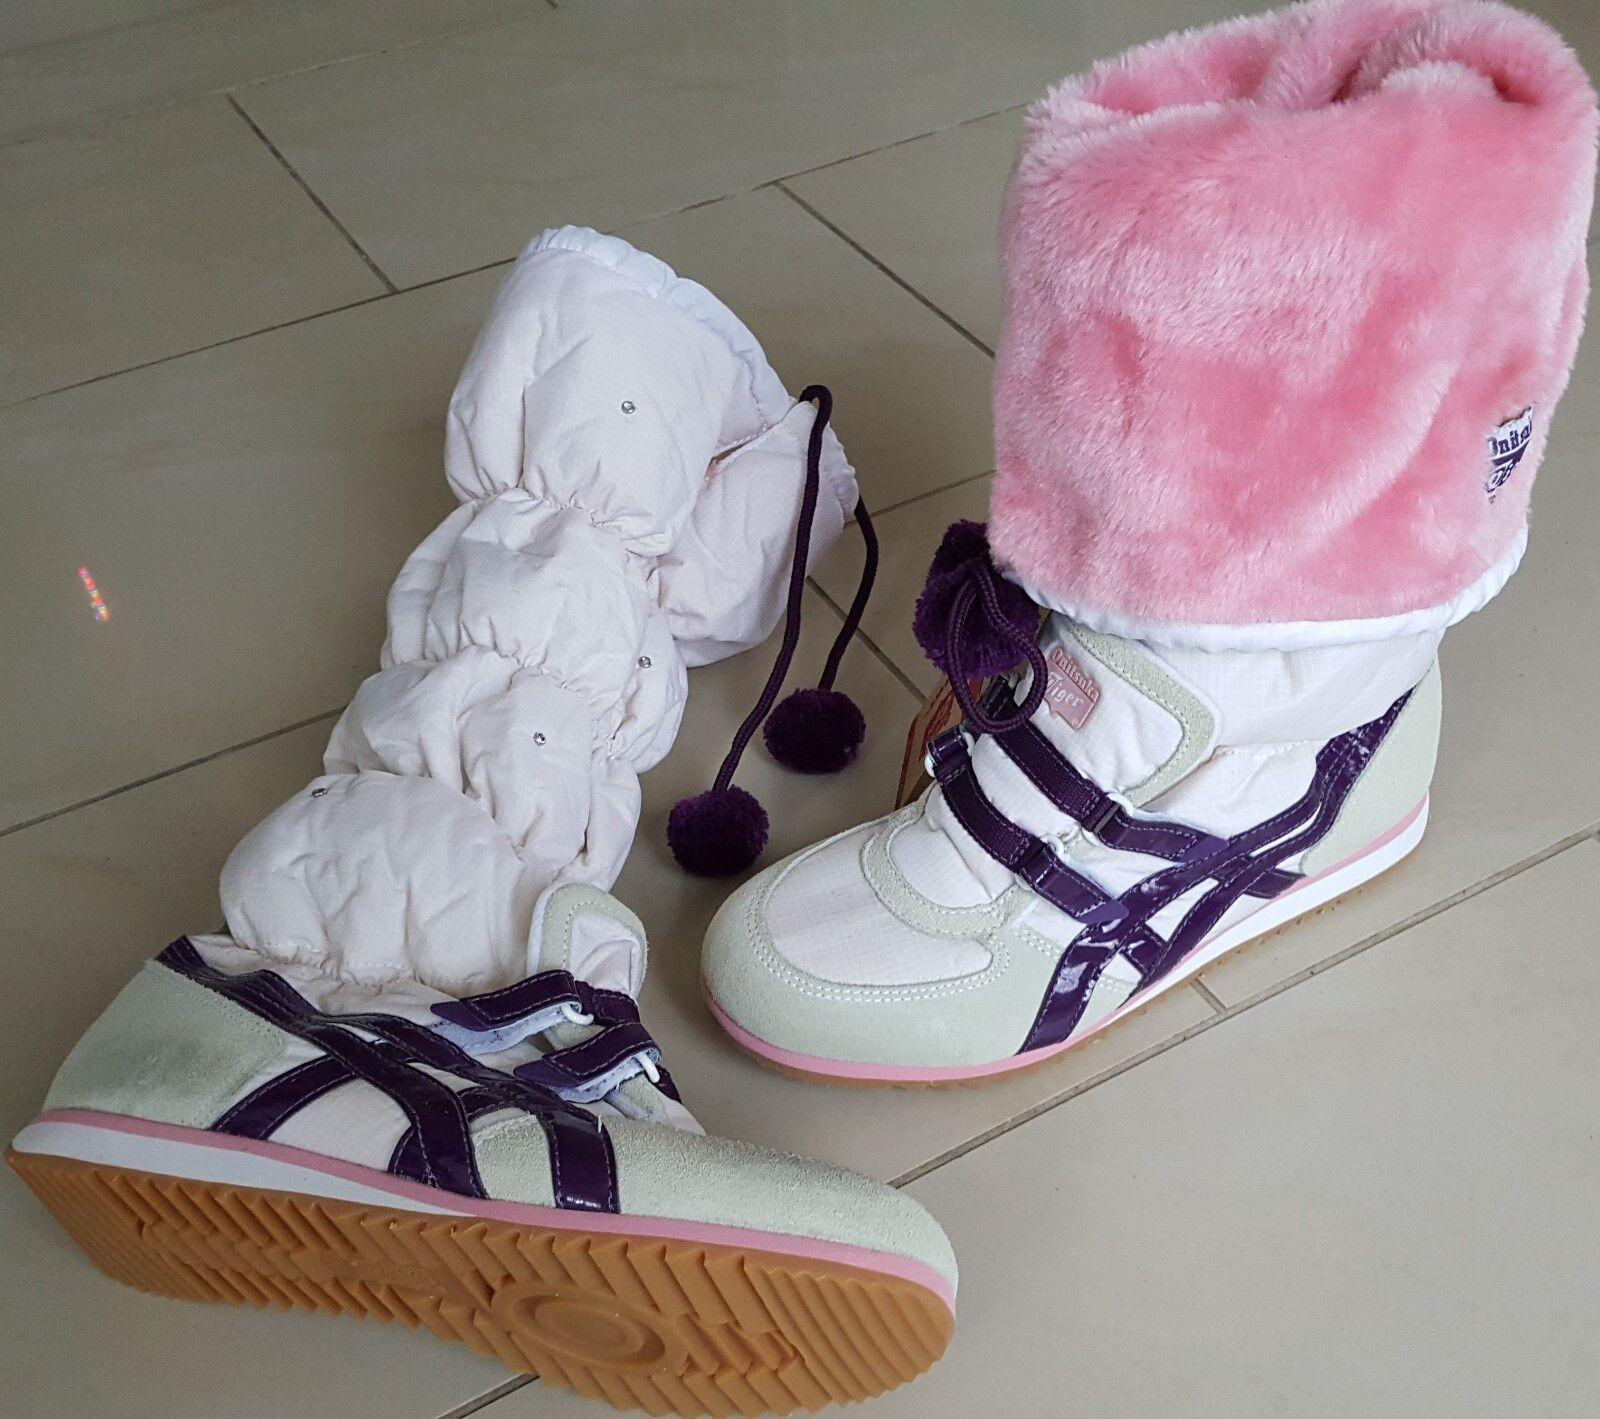 ASICS Onitsuka Tiger Damen Stiefel Snow Heaven72,NEU,Gr39,5Weiß Heaven72,NEU,Gr39,5Weiß Snow Lila Bäsch-Cream c6a5b9